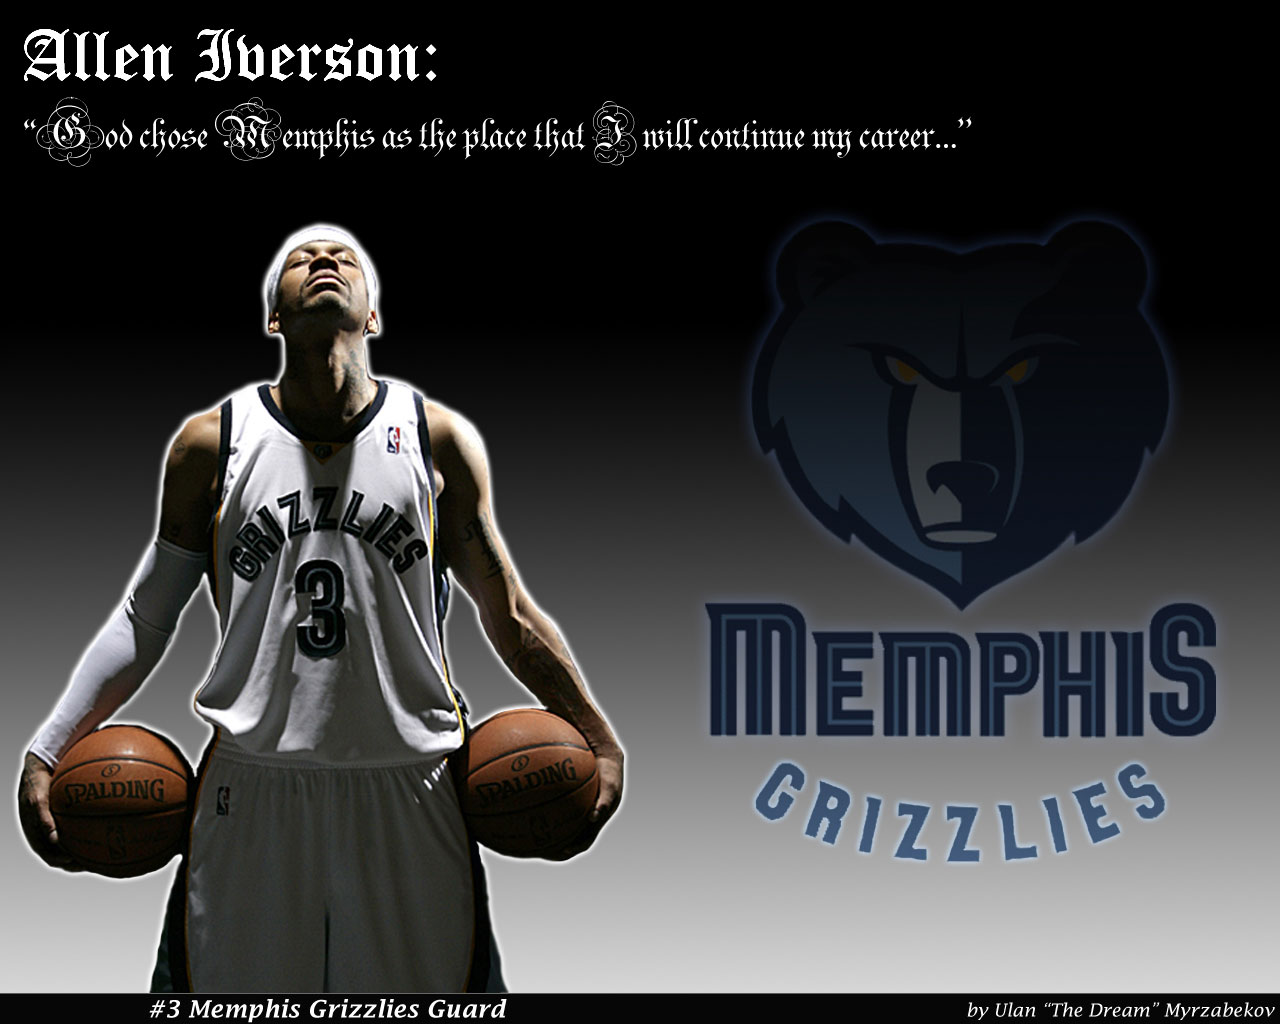 Allen Iverson's quote #5